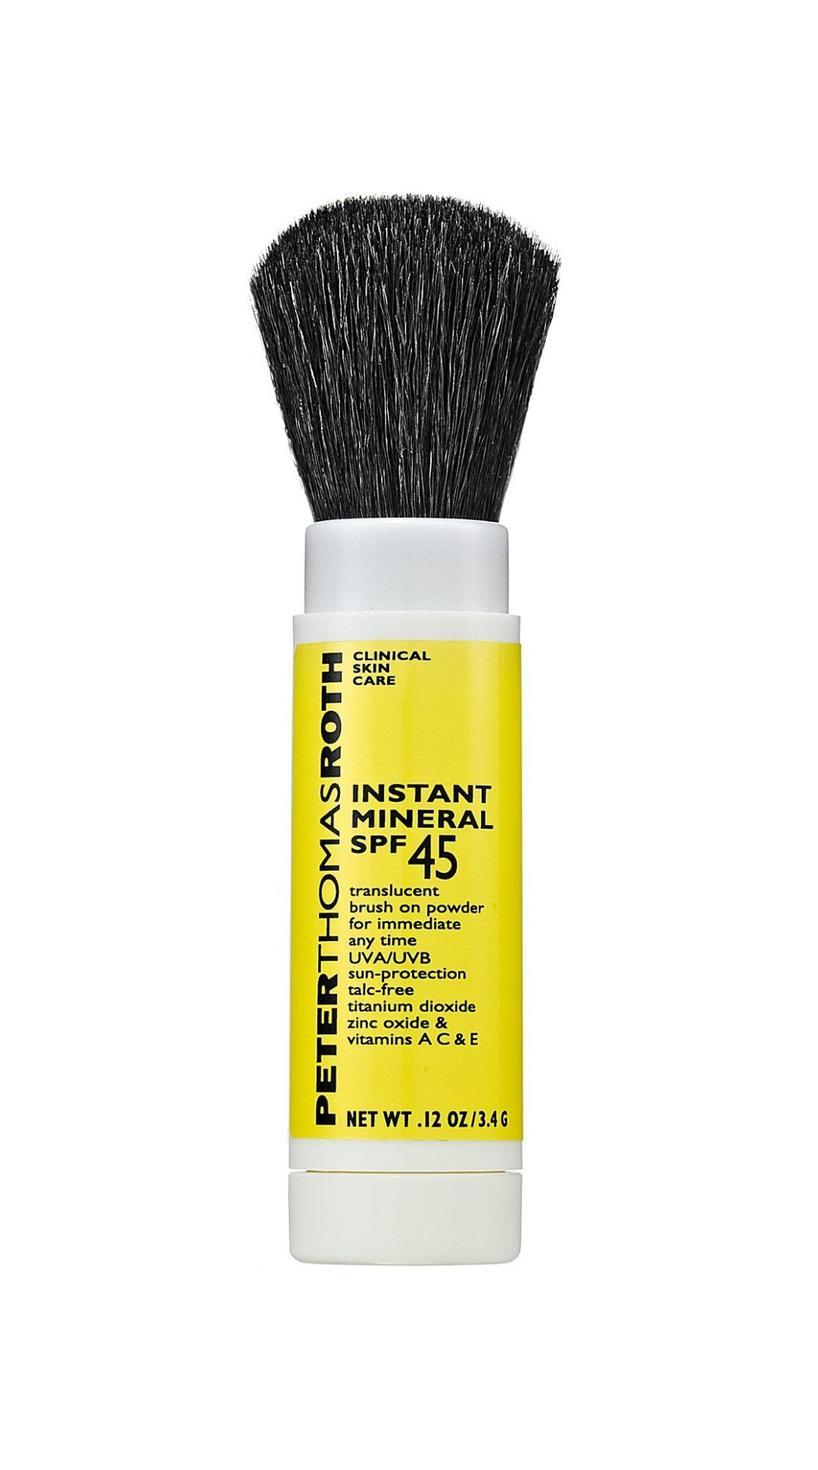 SPF, Powder SPF, Beauty, Skincare, UAE, Powder Sunscreen